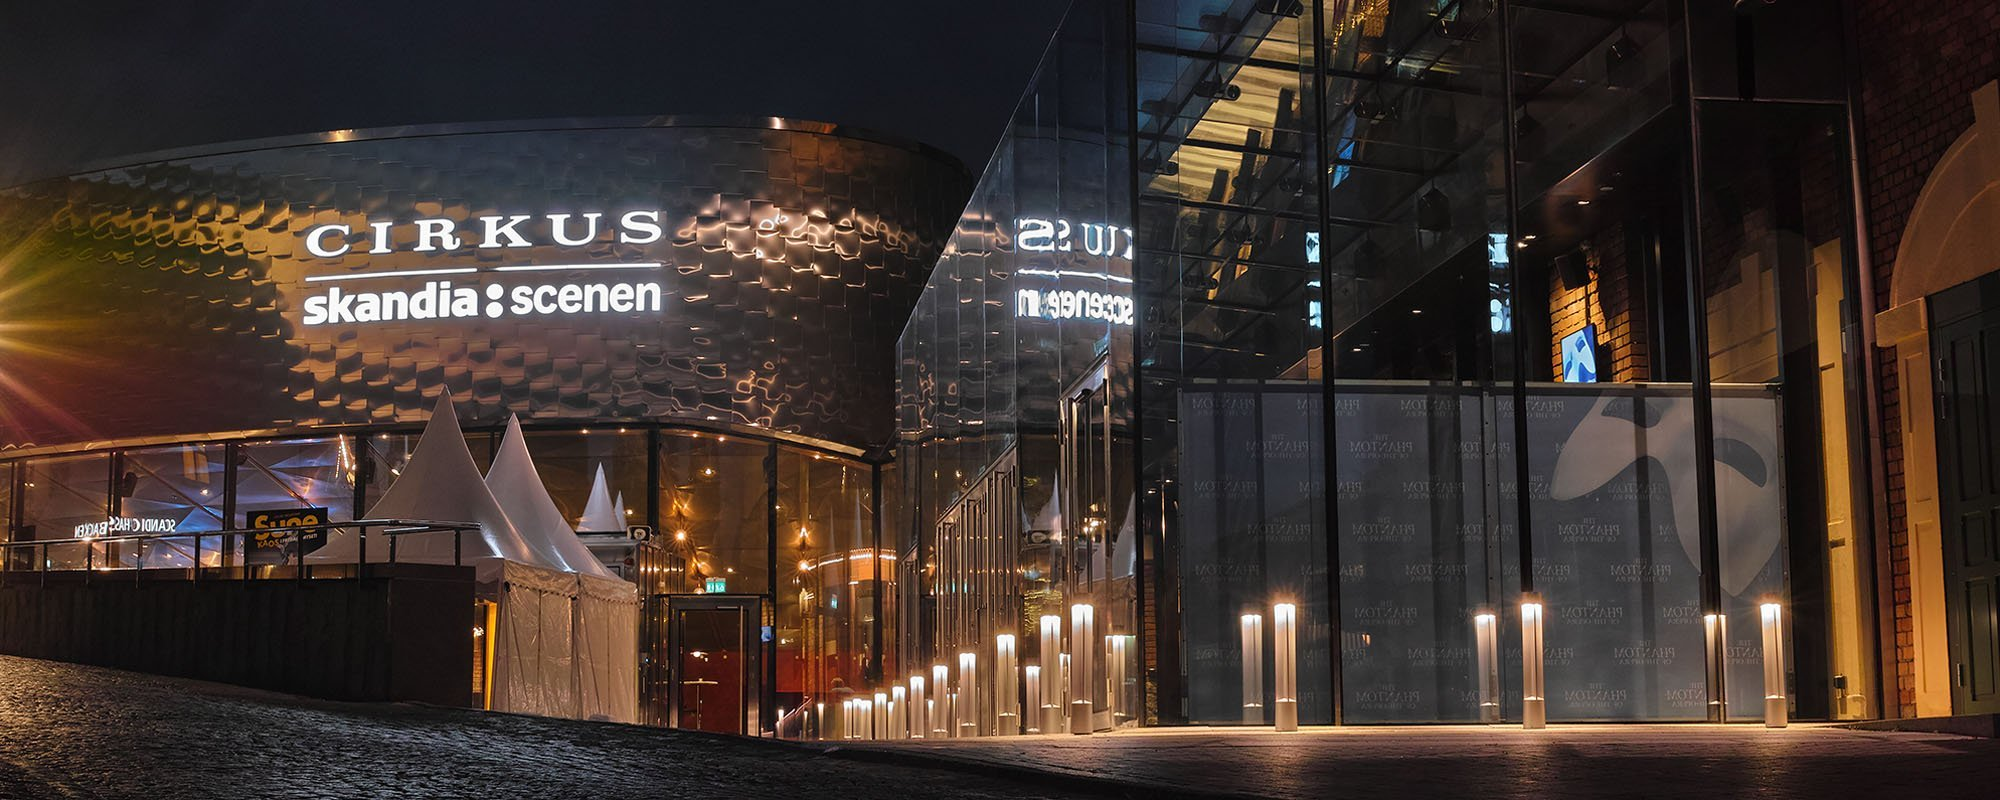 Cirkus Skandiascenen led skylt utomhus | FocusNeo